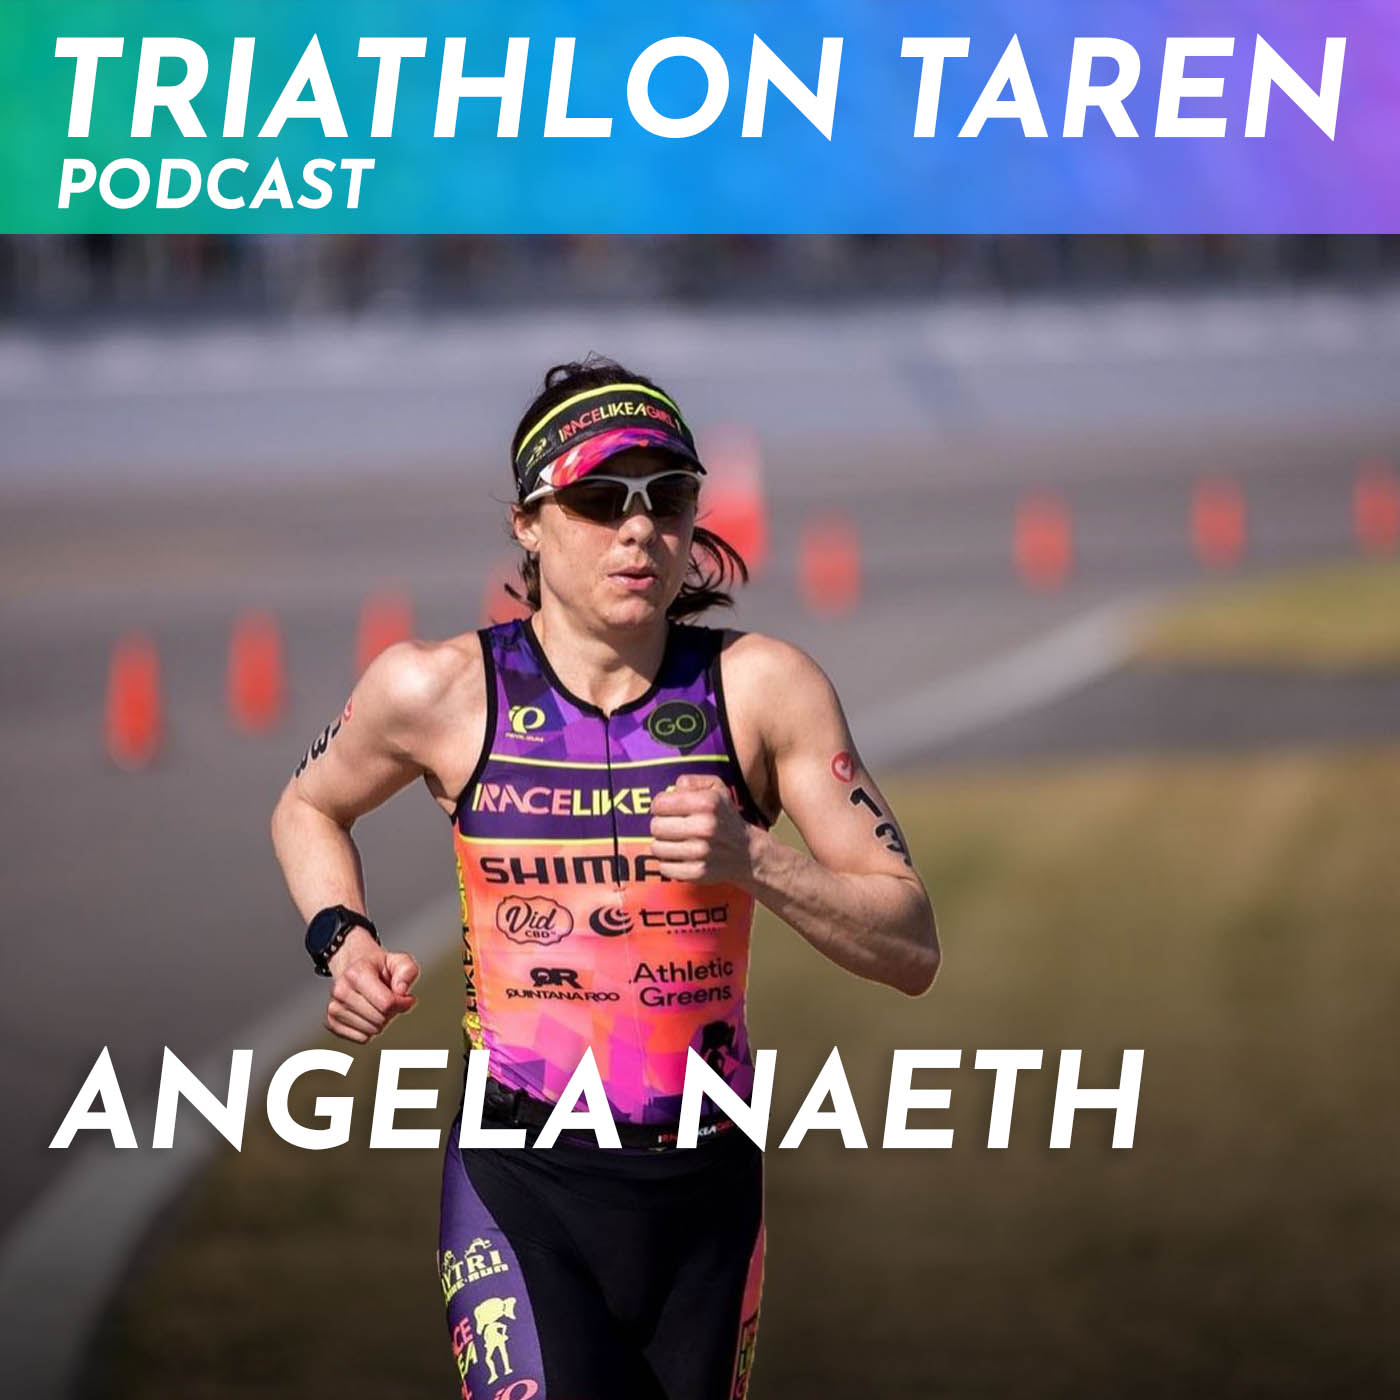 Pro Triathlete with Lyme Disease | Angela Naeth